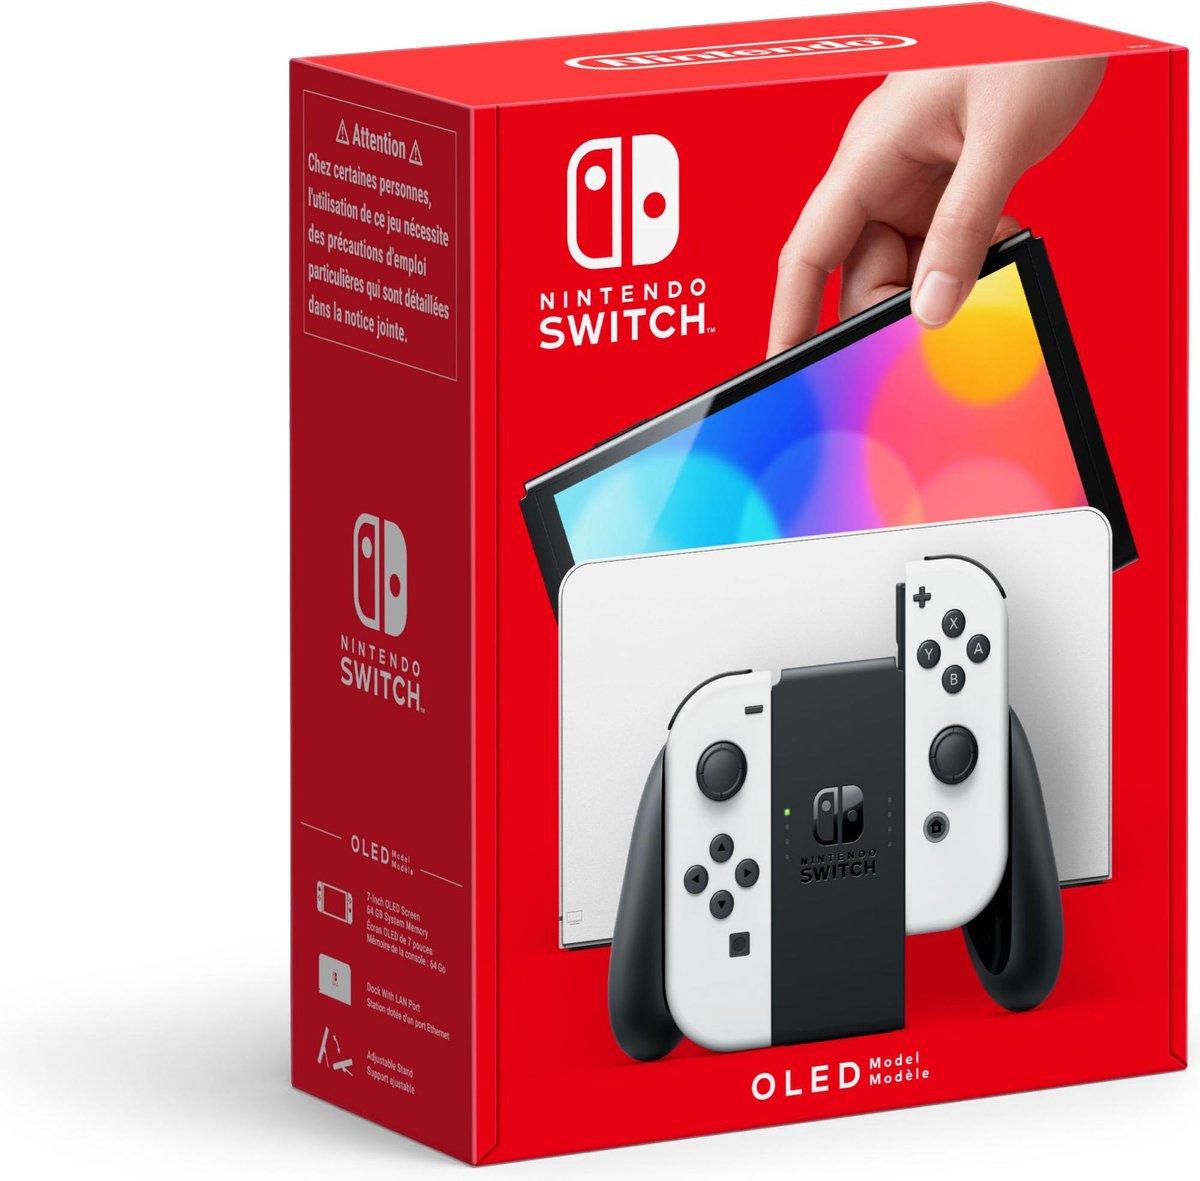 Nintendo switch OLED (Wit & blauw-rood) pre-order @Bol.com